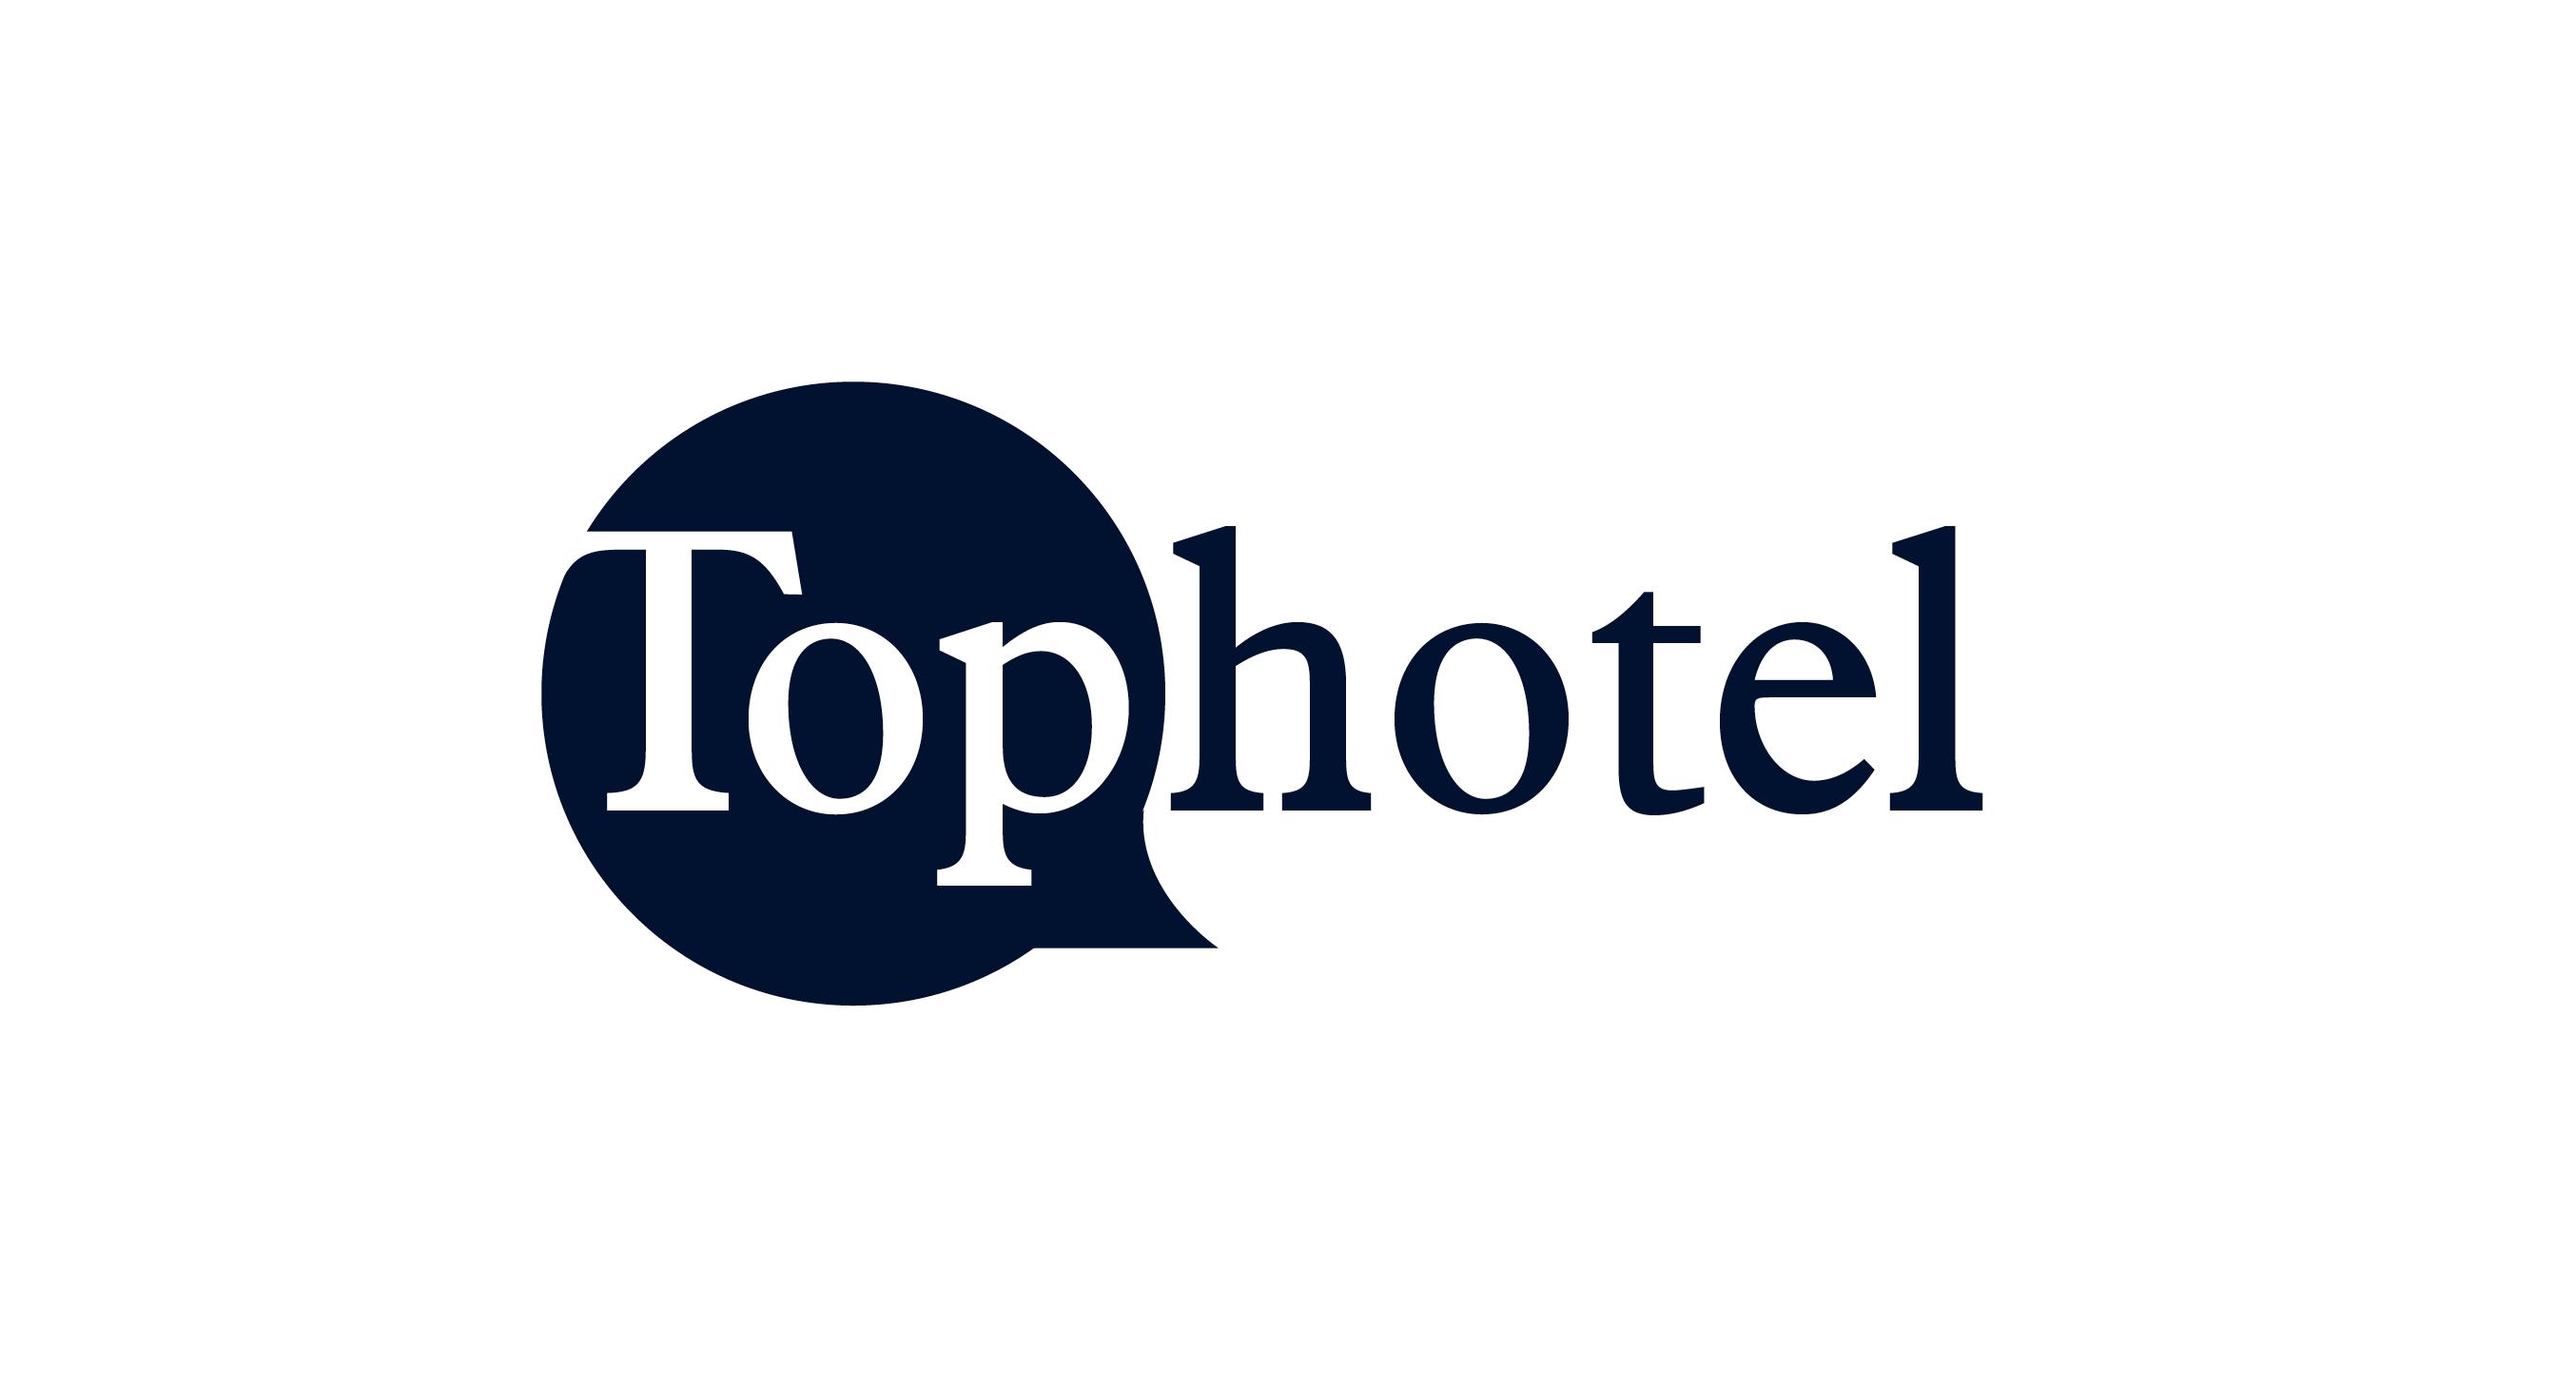 Tophotel logo